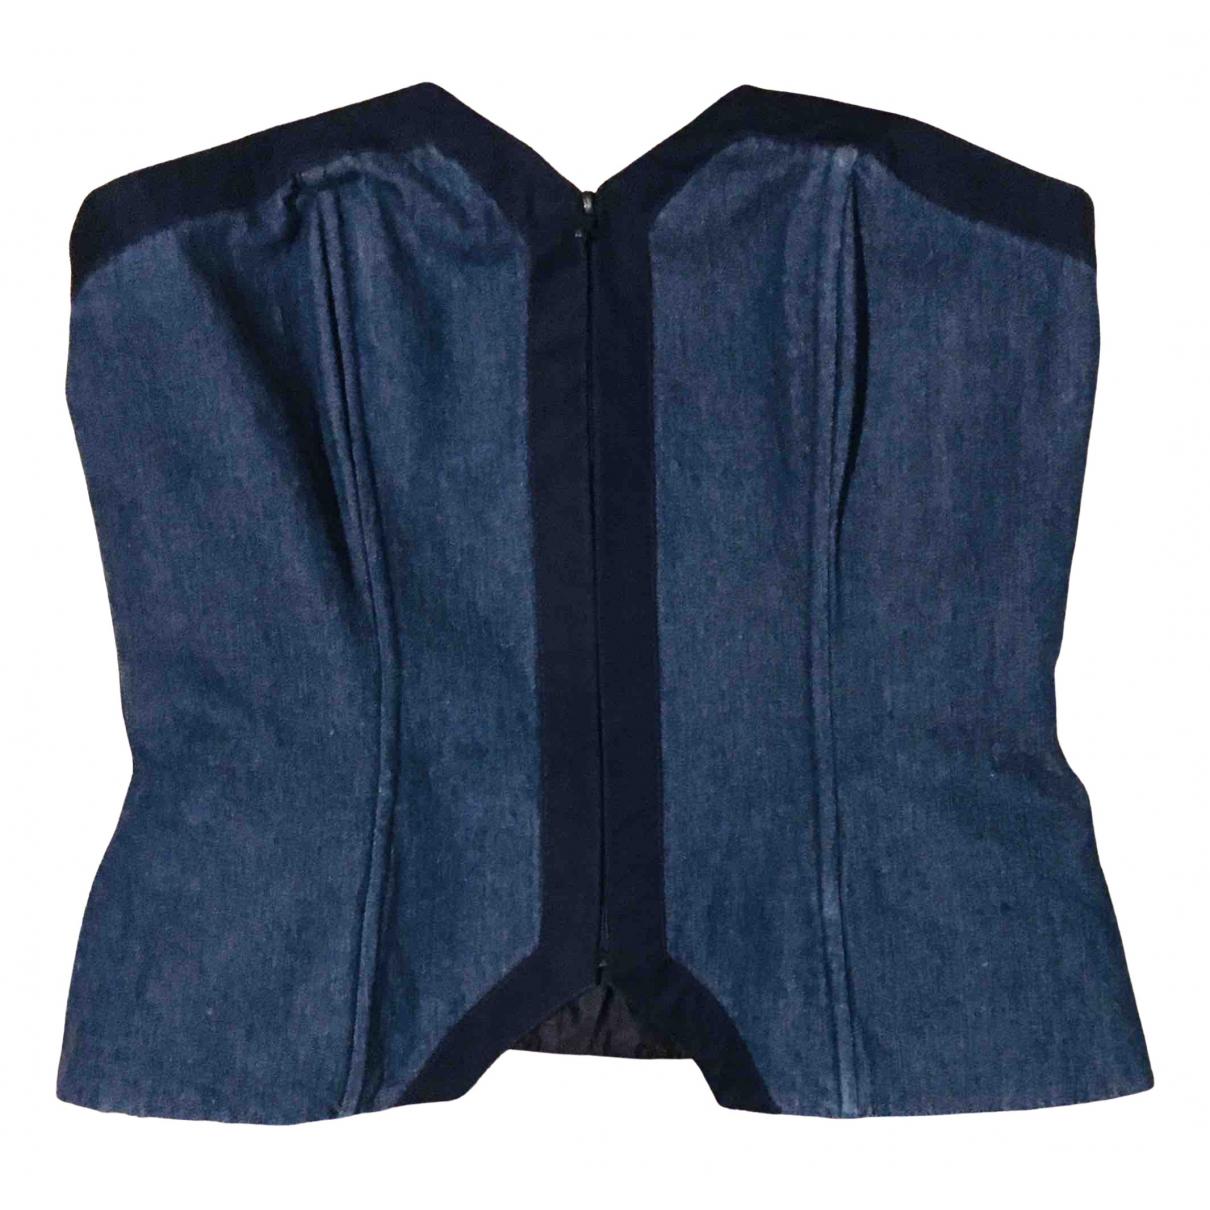 Guy Laroche - Top   pour femme en denim - bleu